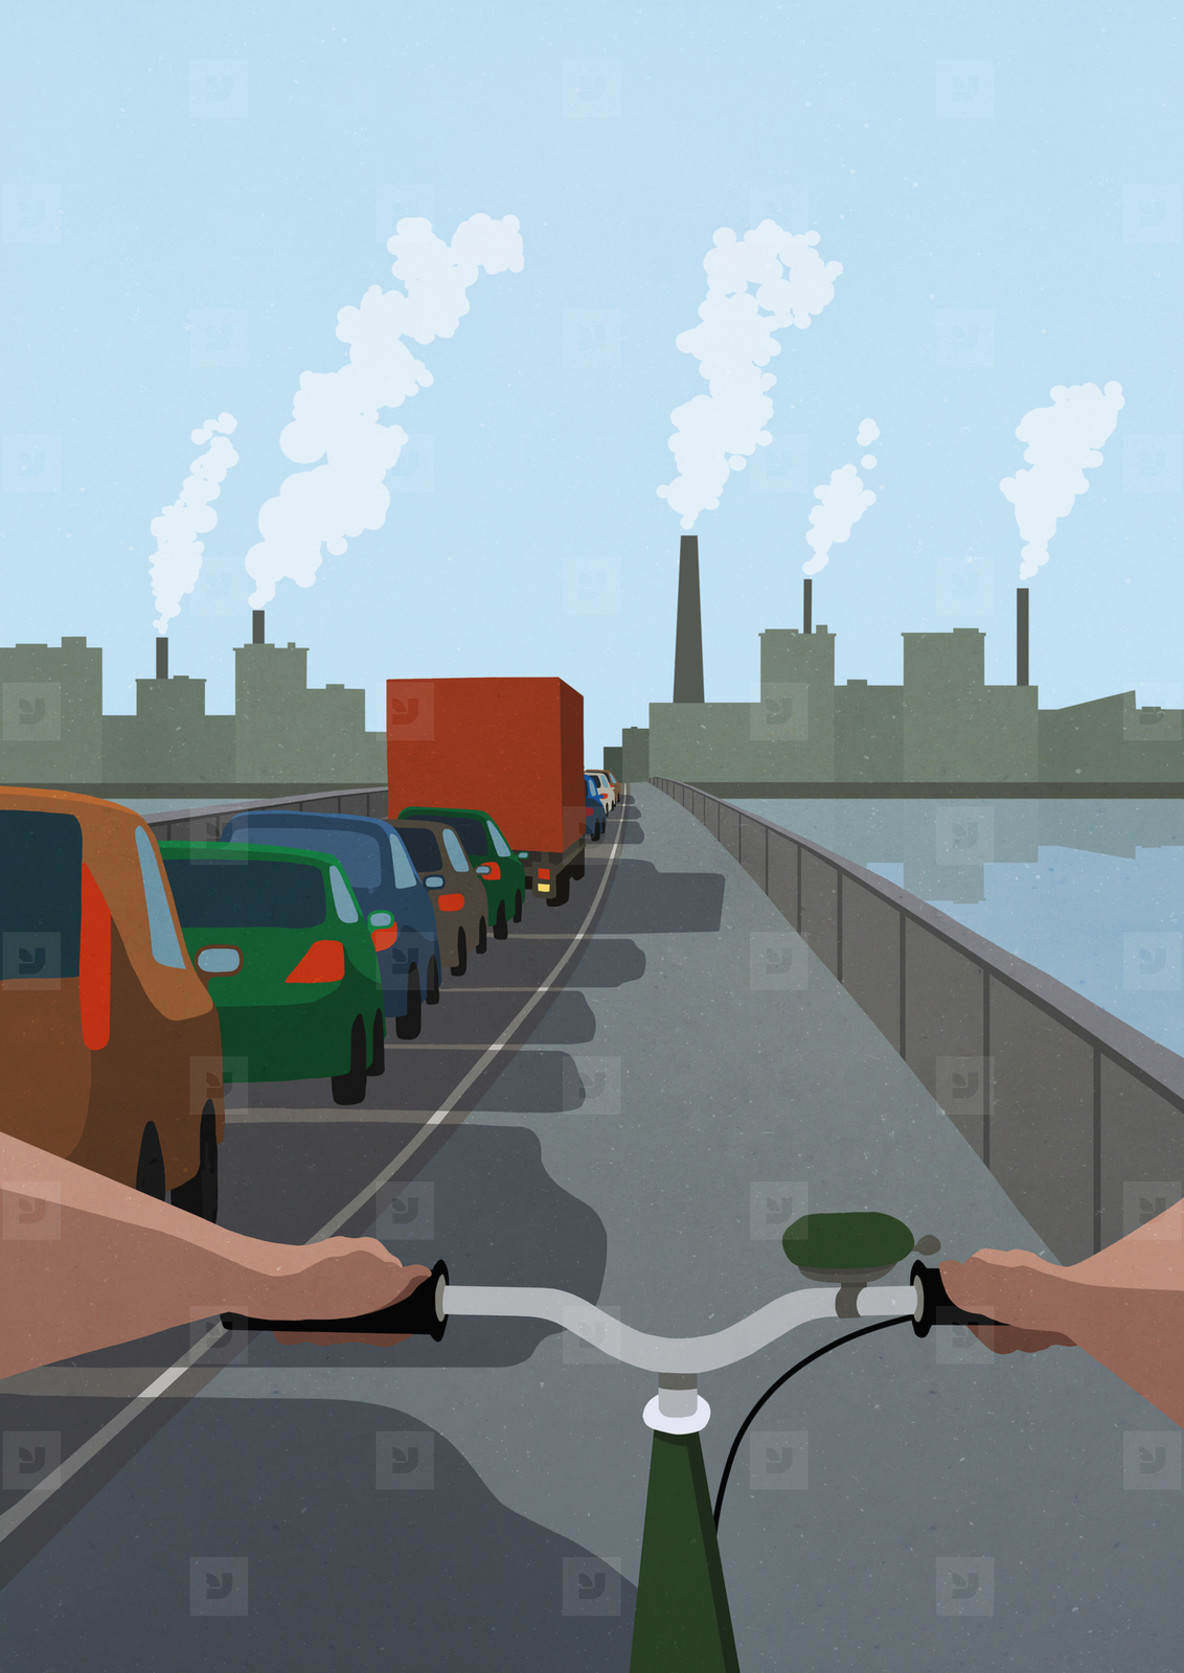 POV Bicycle in bike lane passing cars stuck in traffic jam on bridge